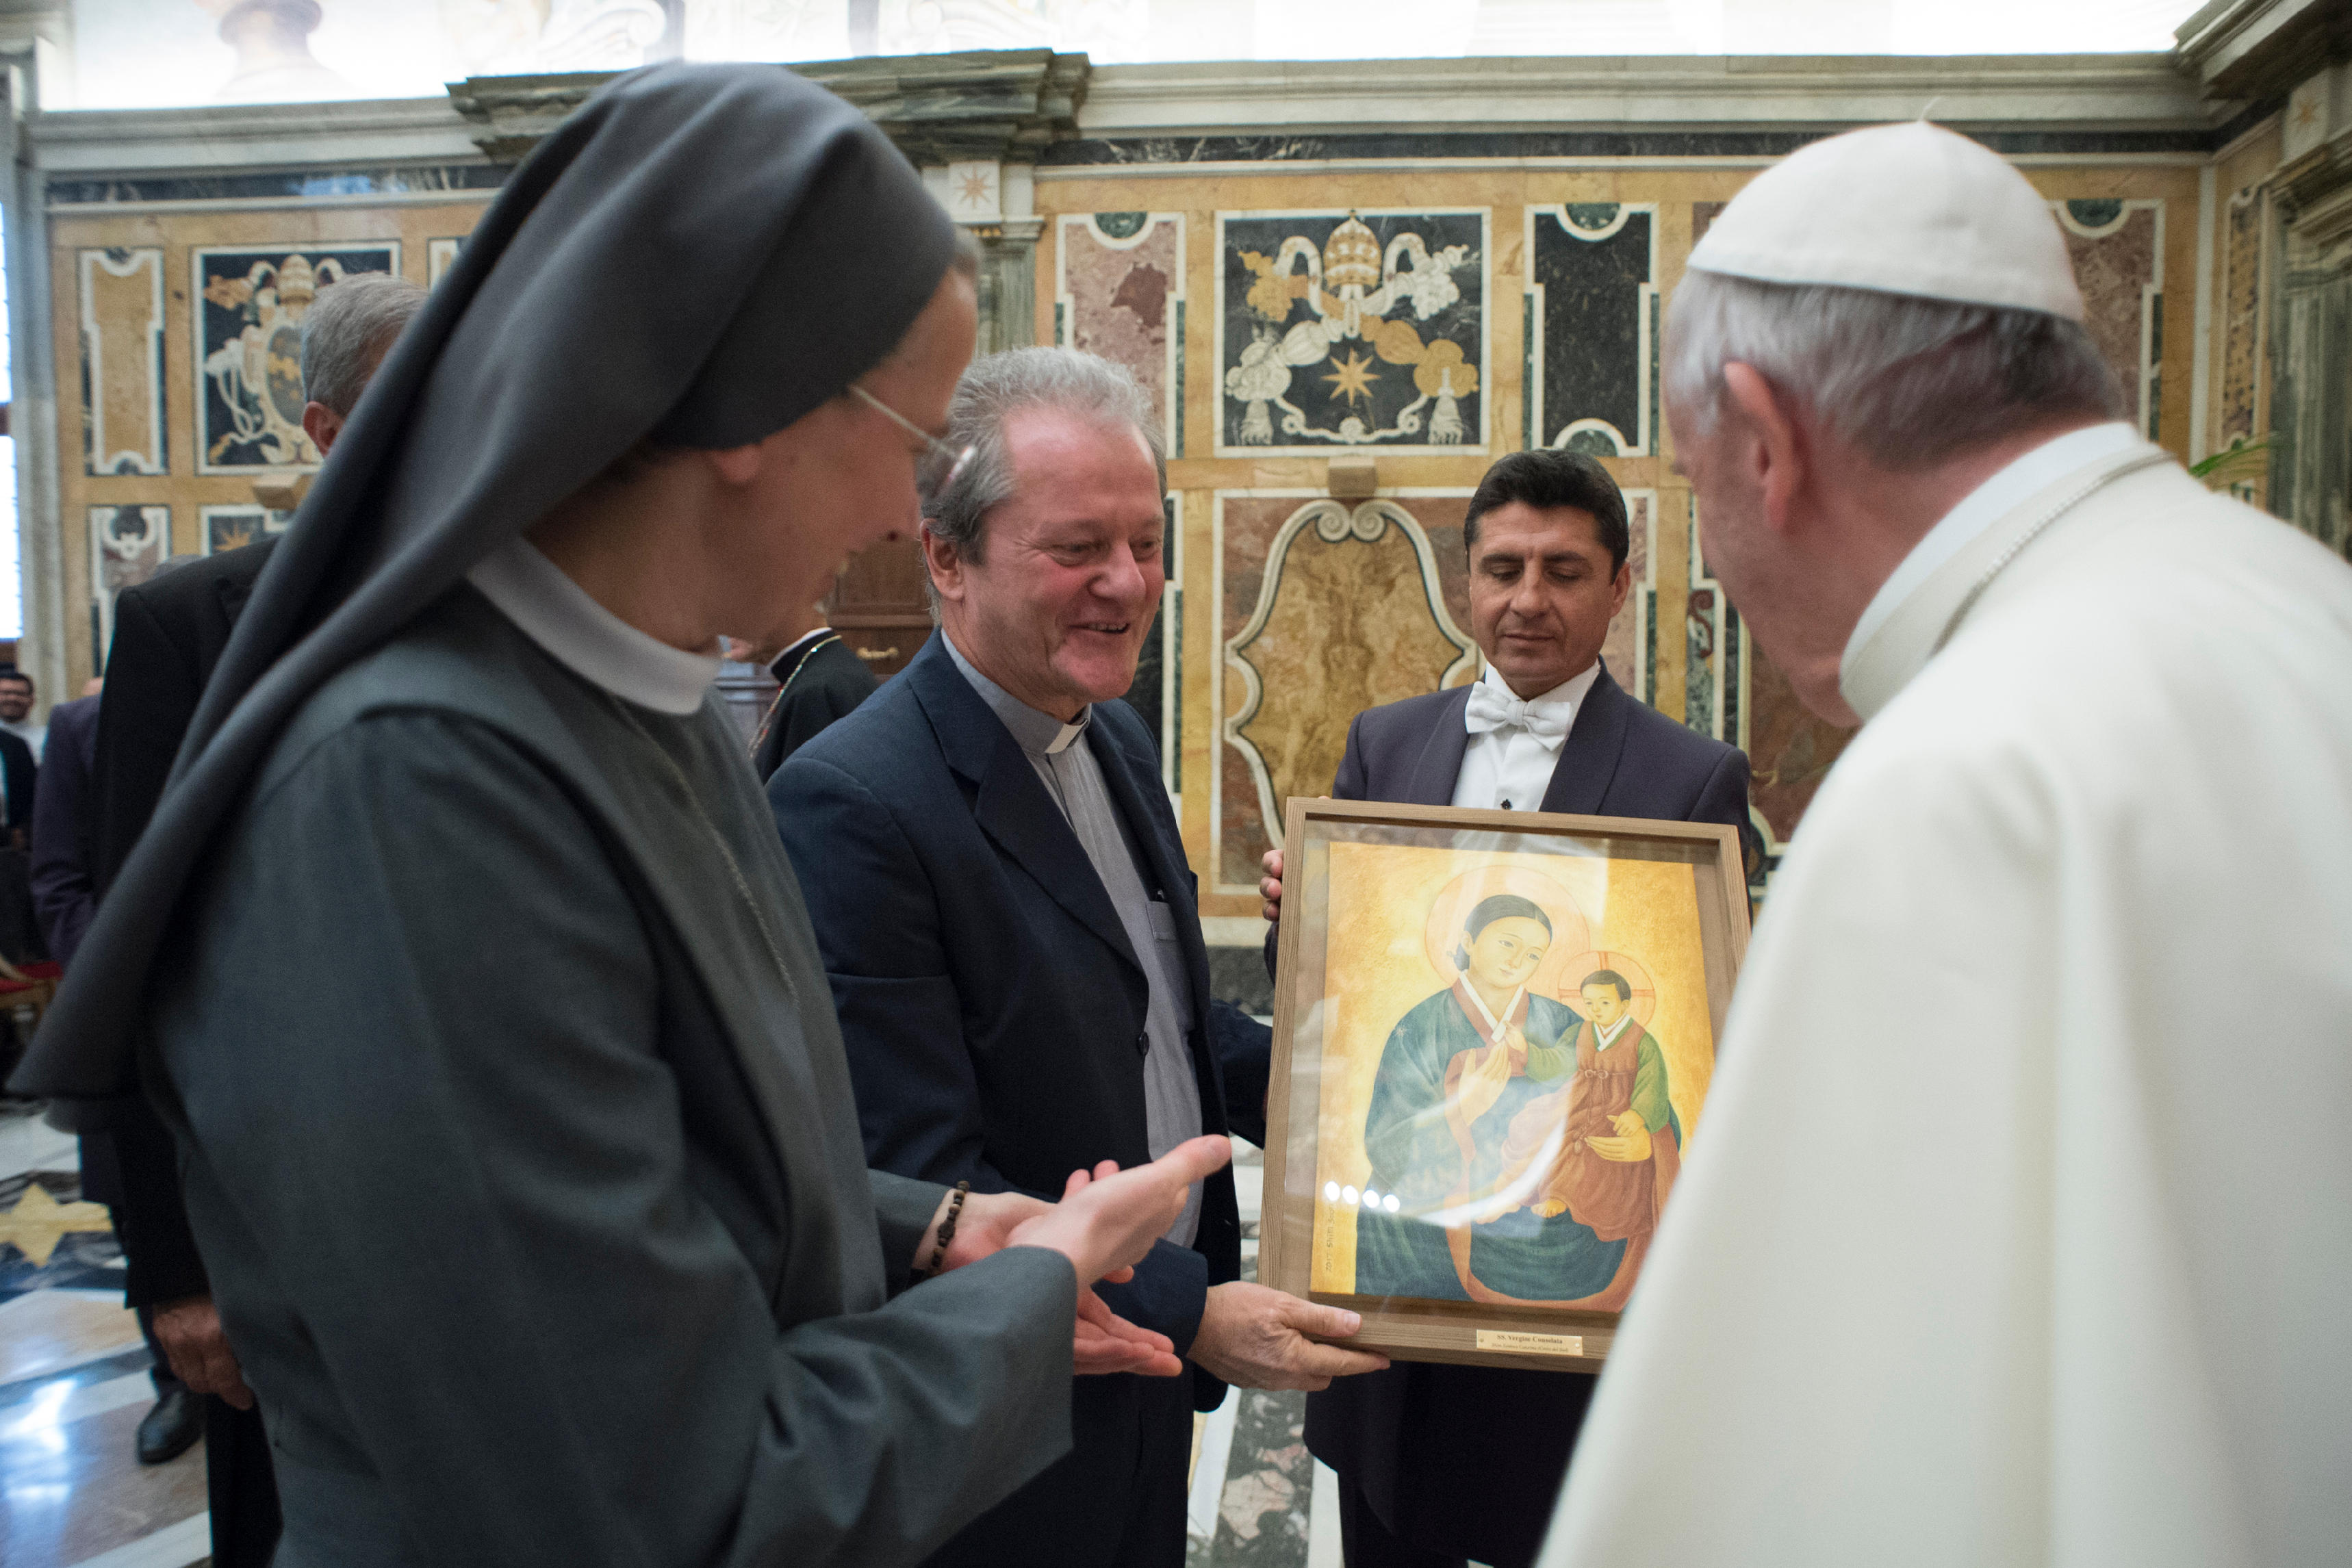 Misisonnaires de la Consolata 5 juin 2017 © L'Osservatore Romano